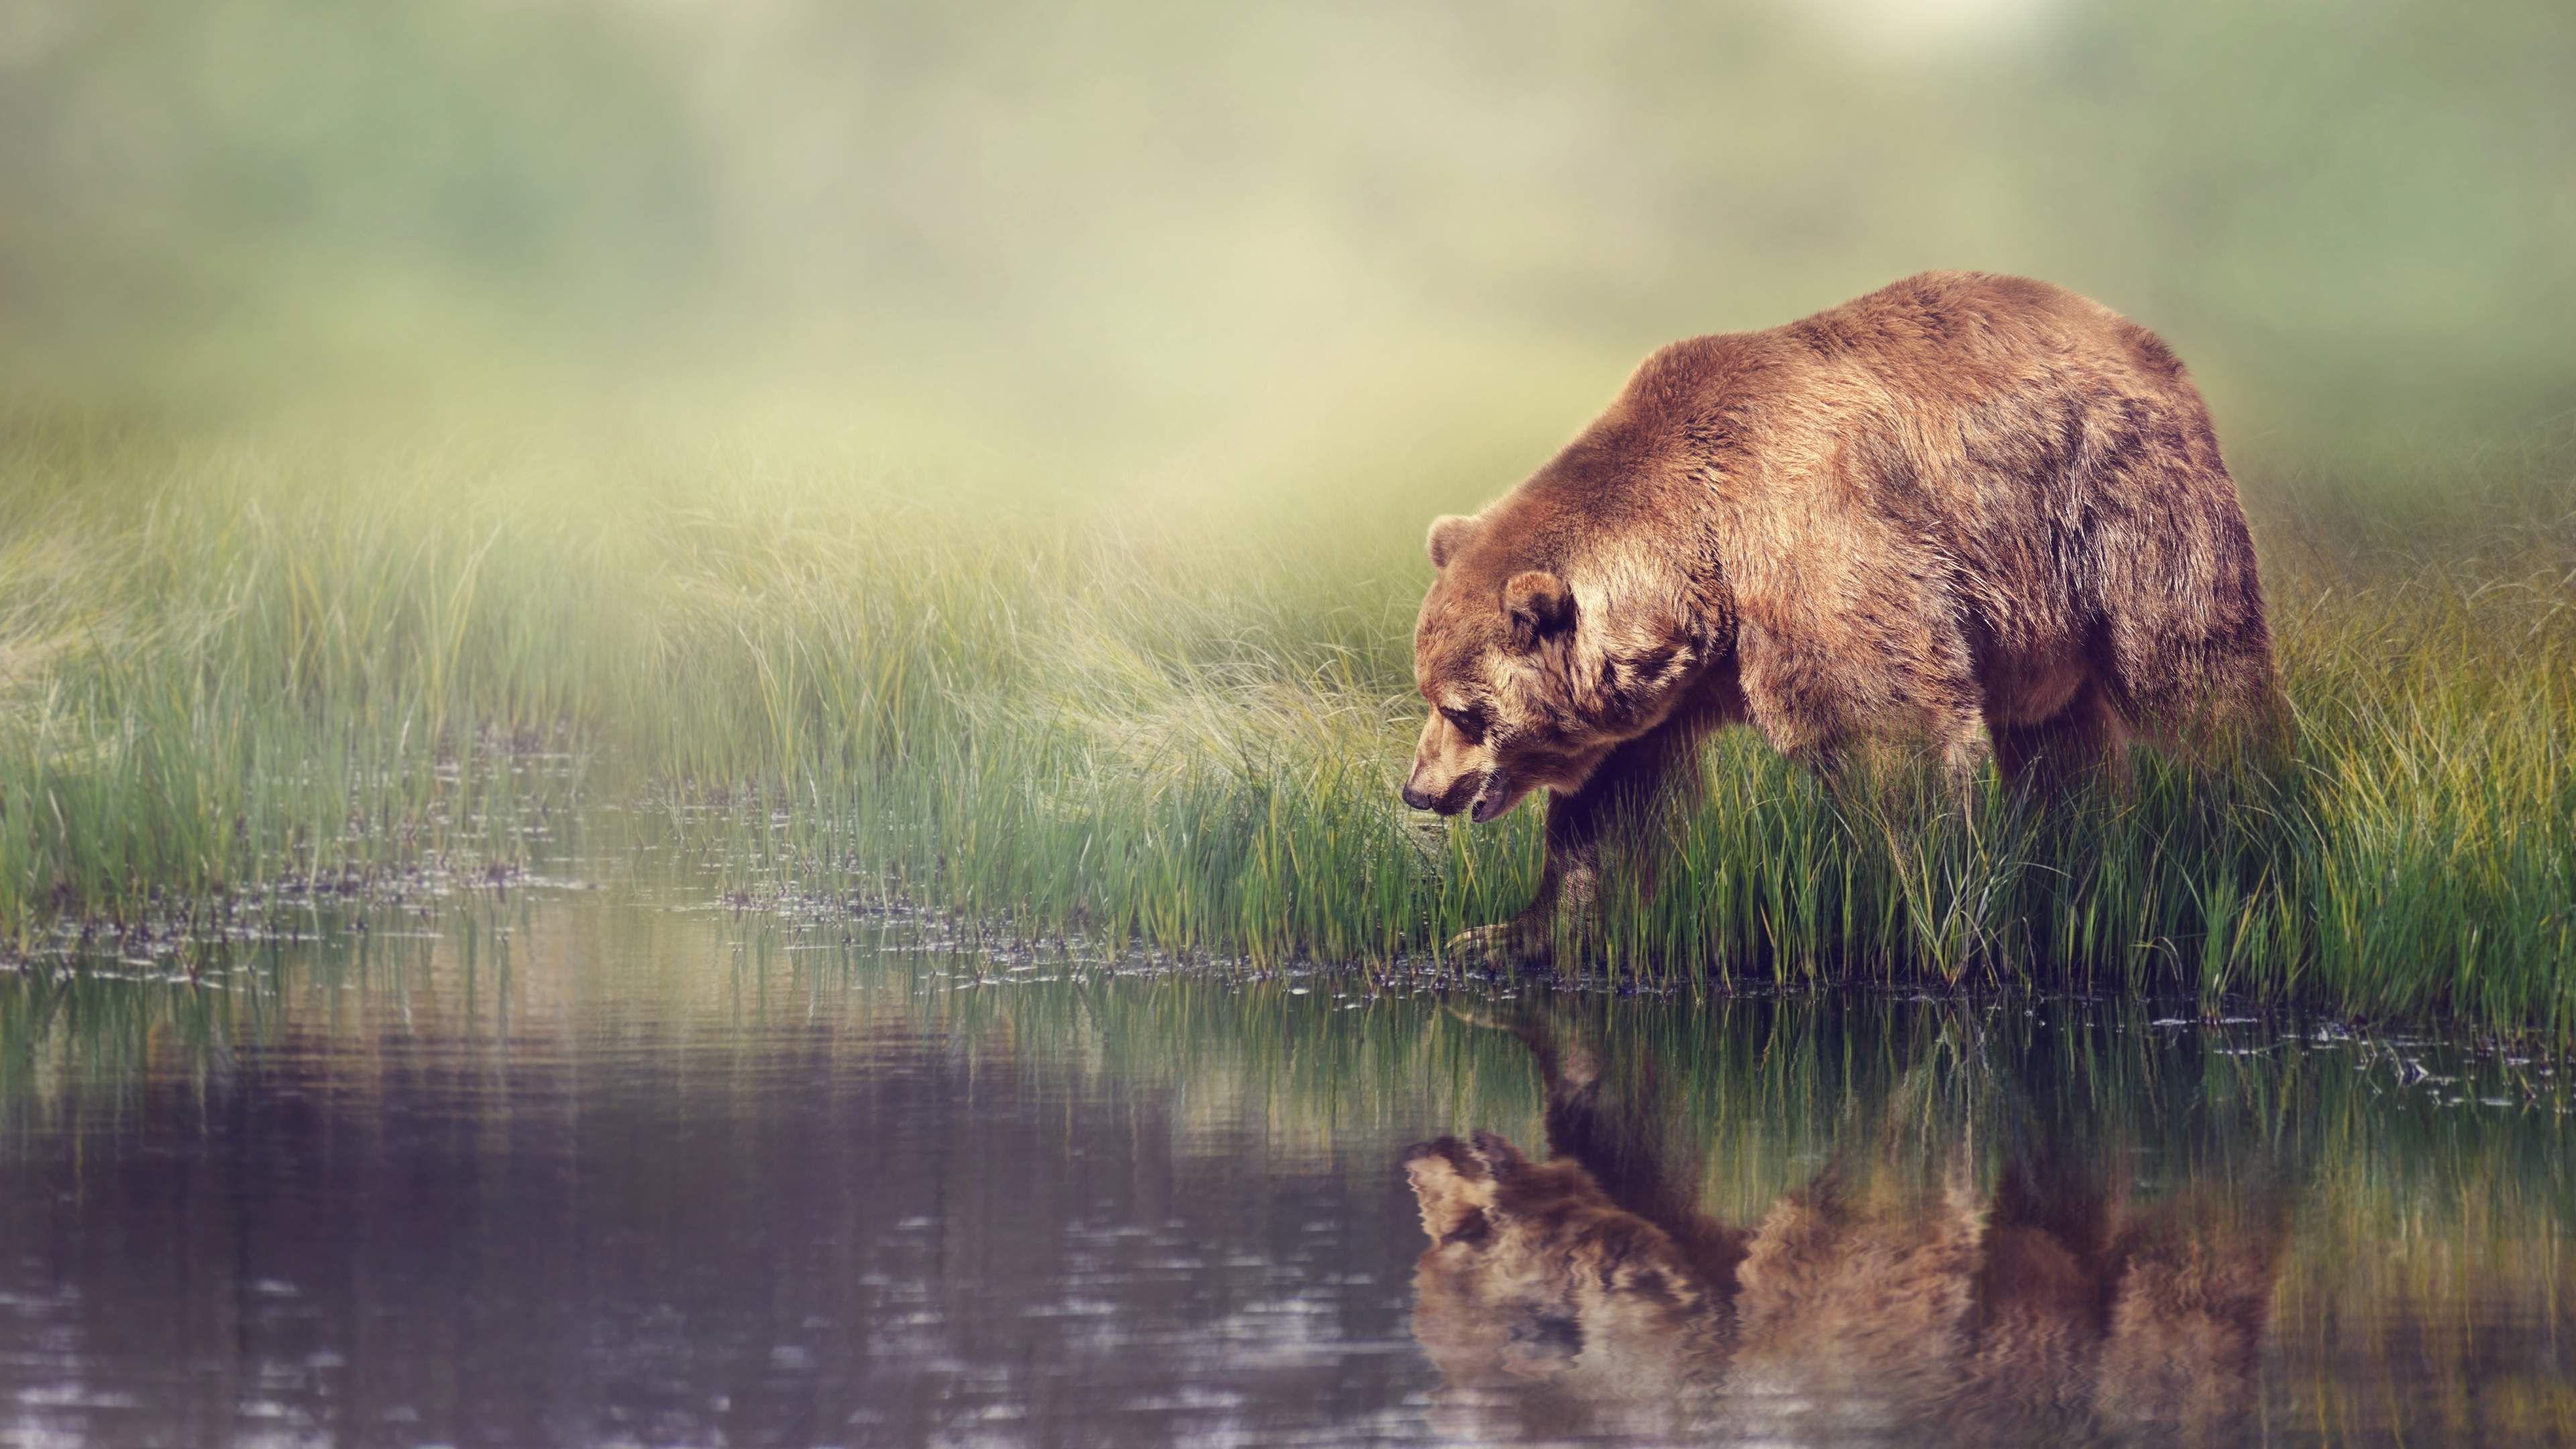 grizzlybearanimal4kwallpaper.jpg (3840×2160)